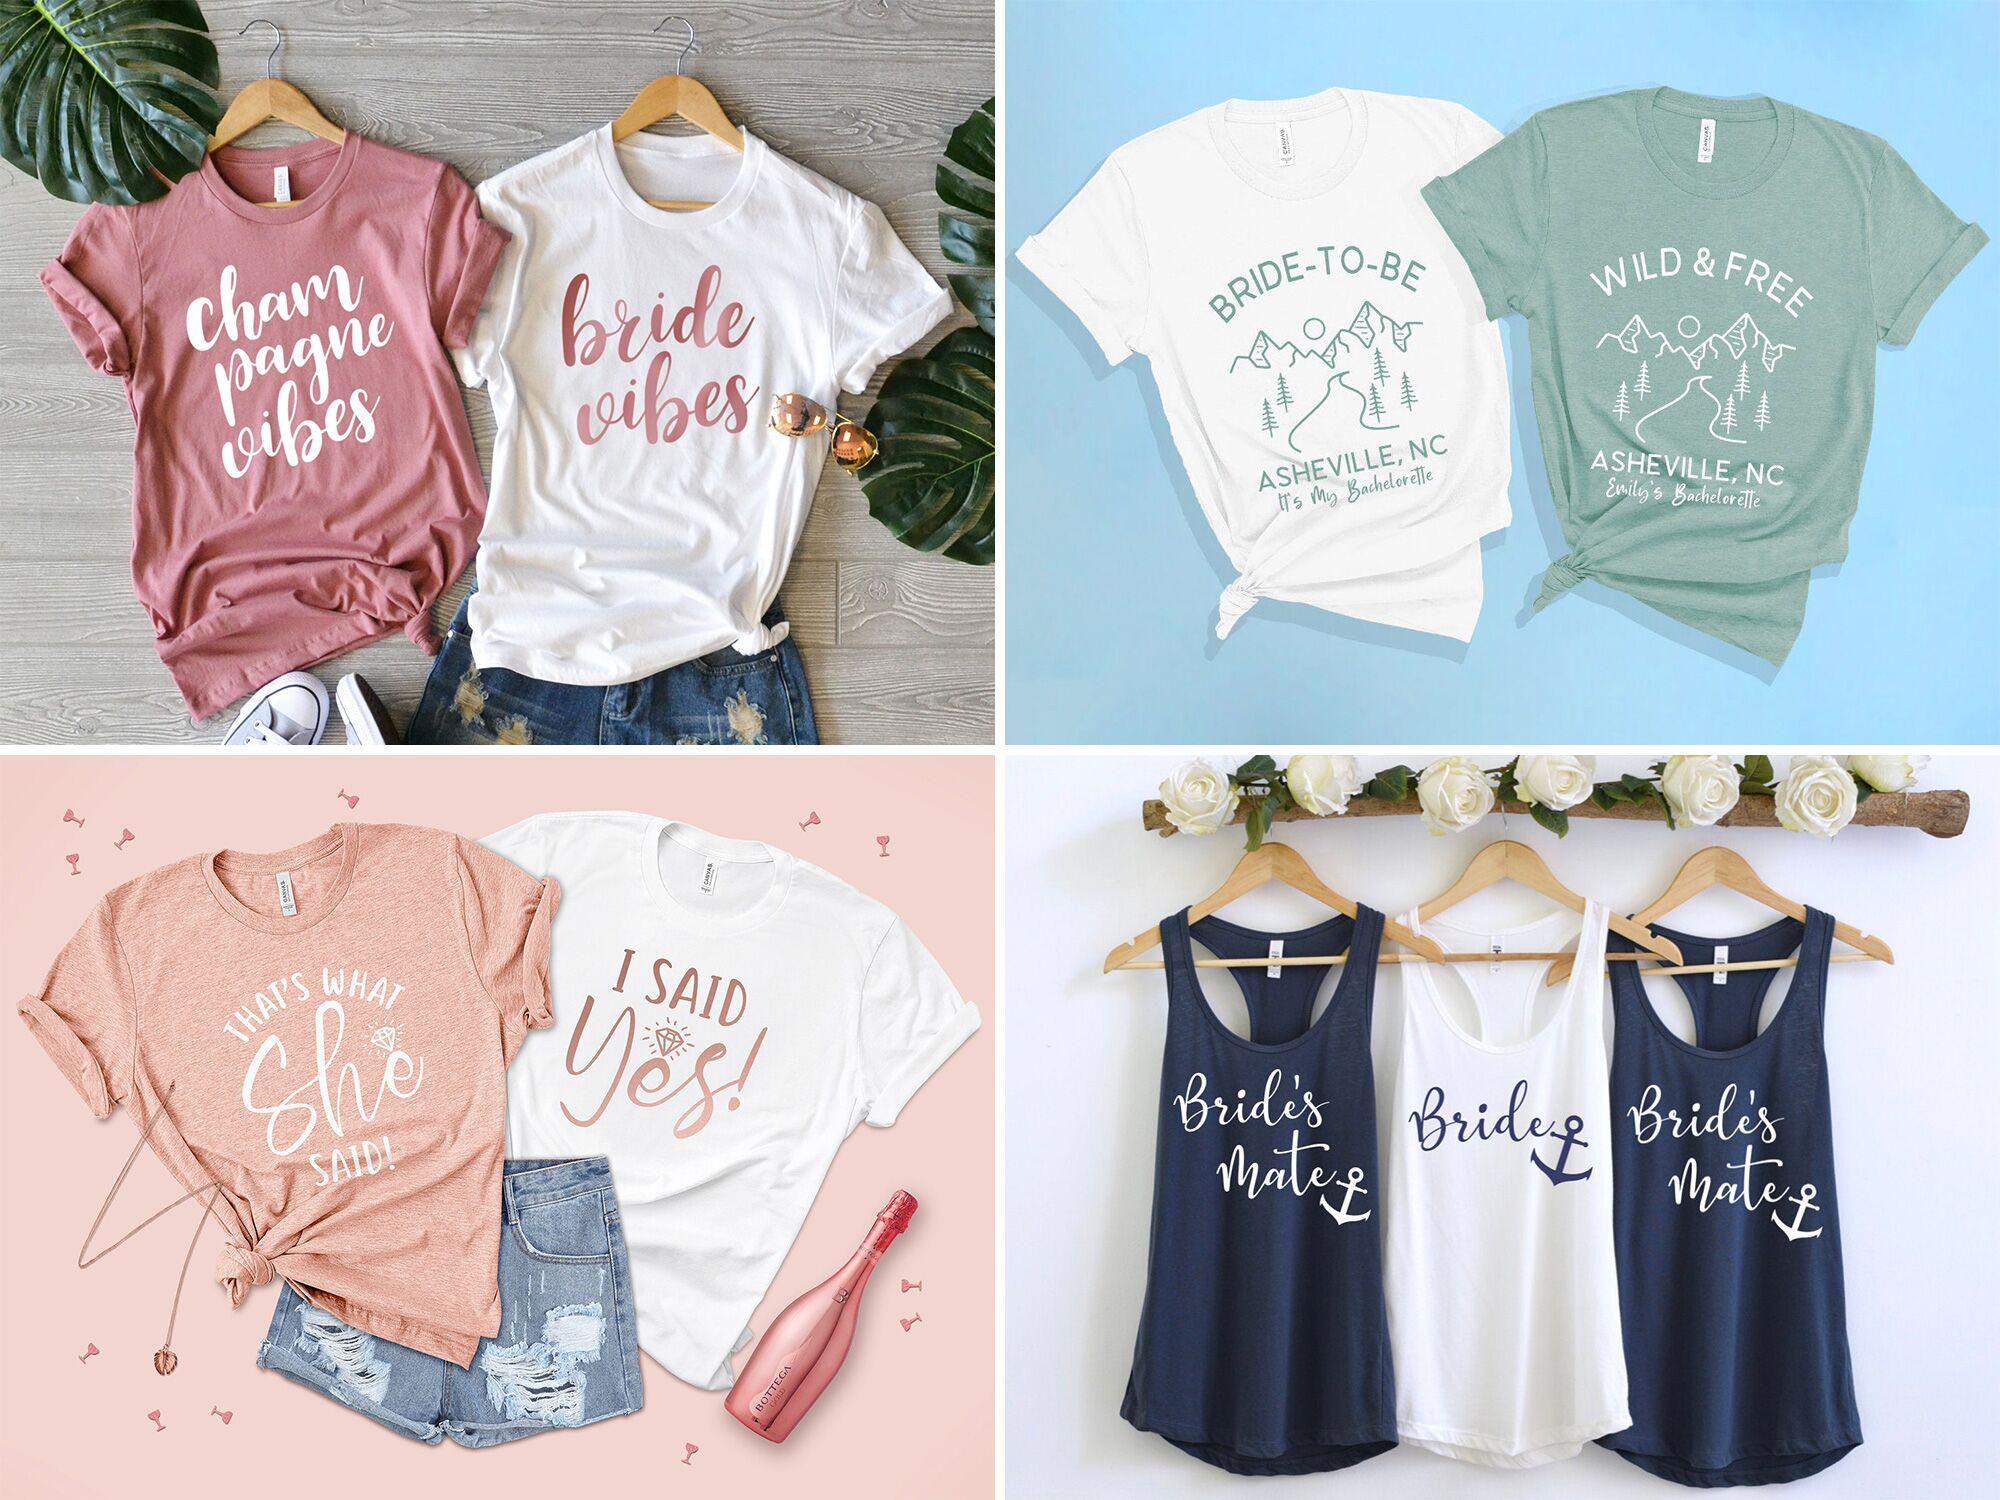 Bridal Shower Gift Mimosa Bachelorette Sweatshirt Bachelorette Shirt Wine Sweatshirt Champagne Shirt Rose All Day Wine Shirt